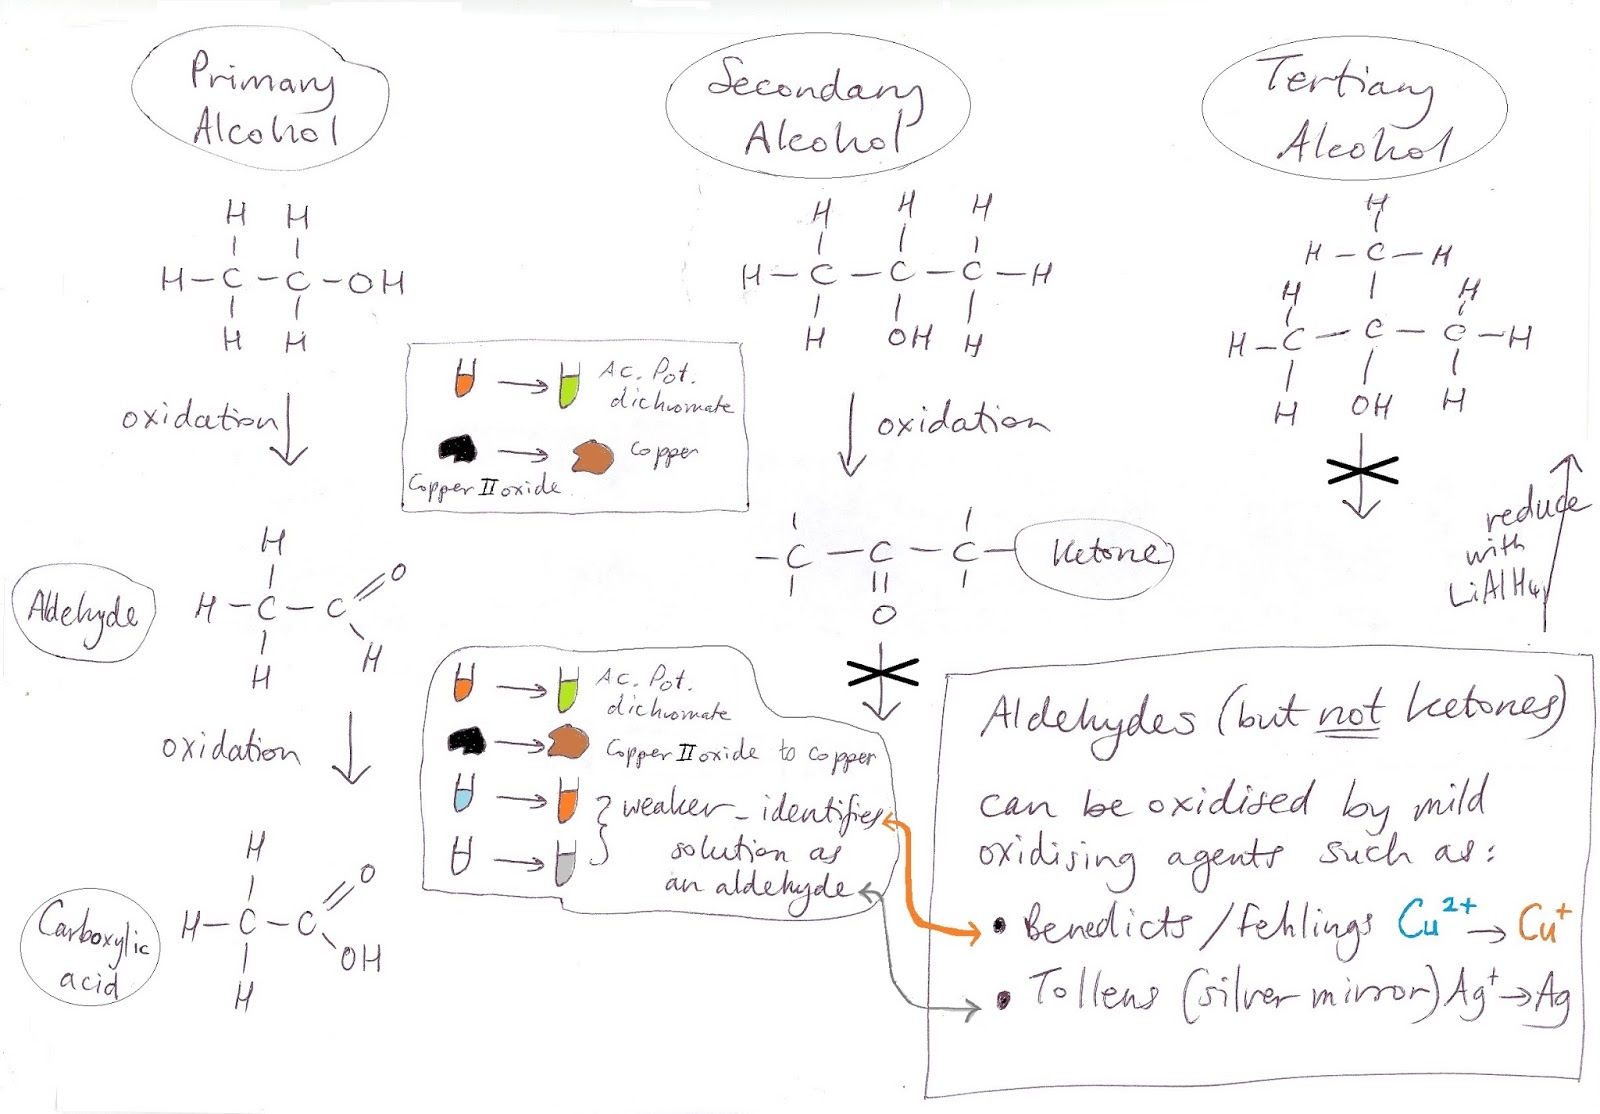 Primary Alcohols/Secondary Alcohols /Aldehydes/Ketones Chart